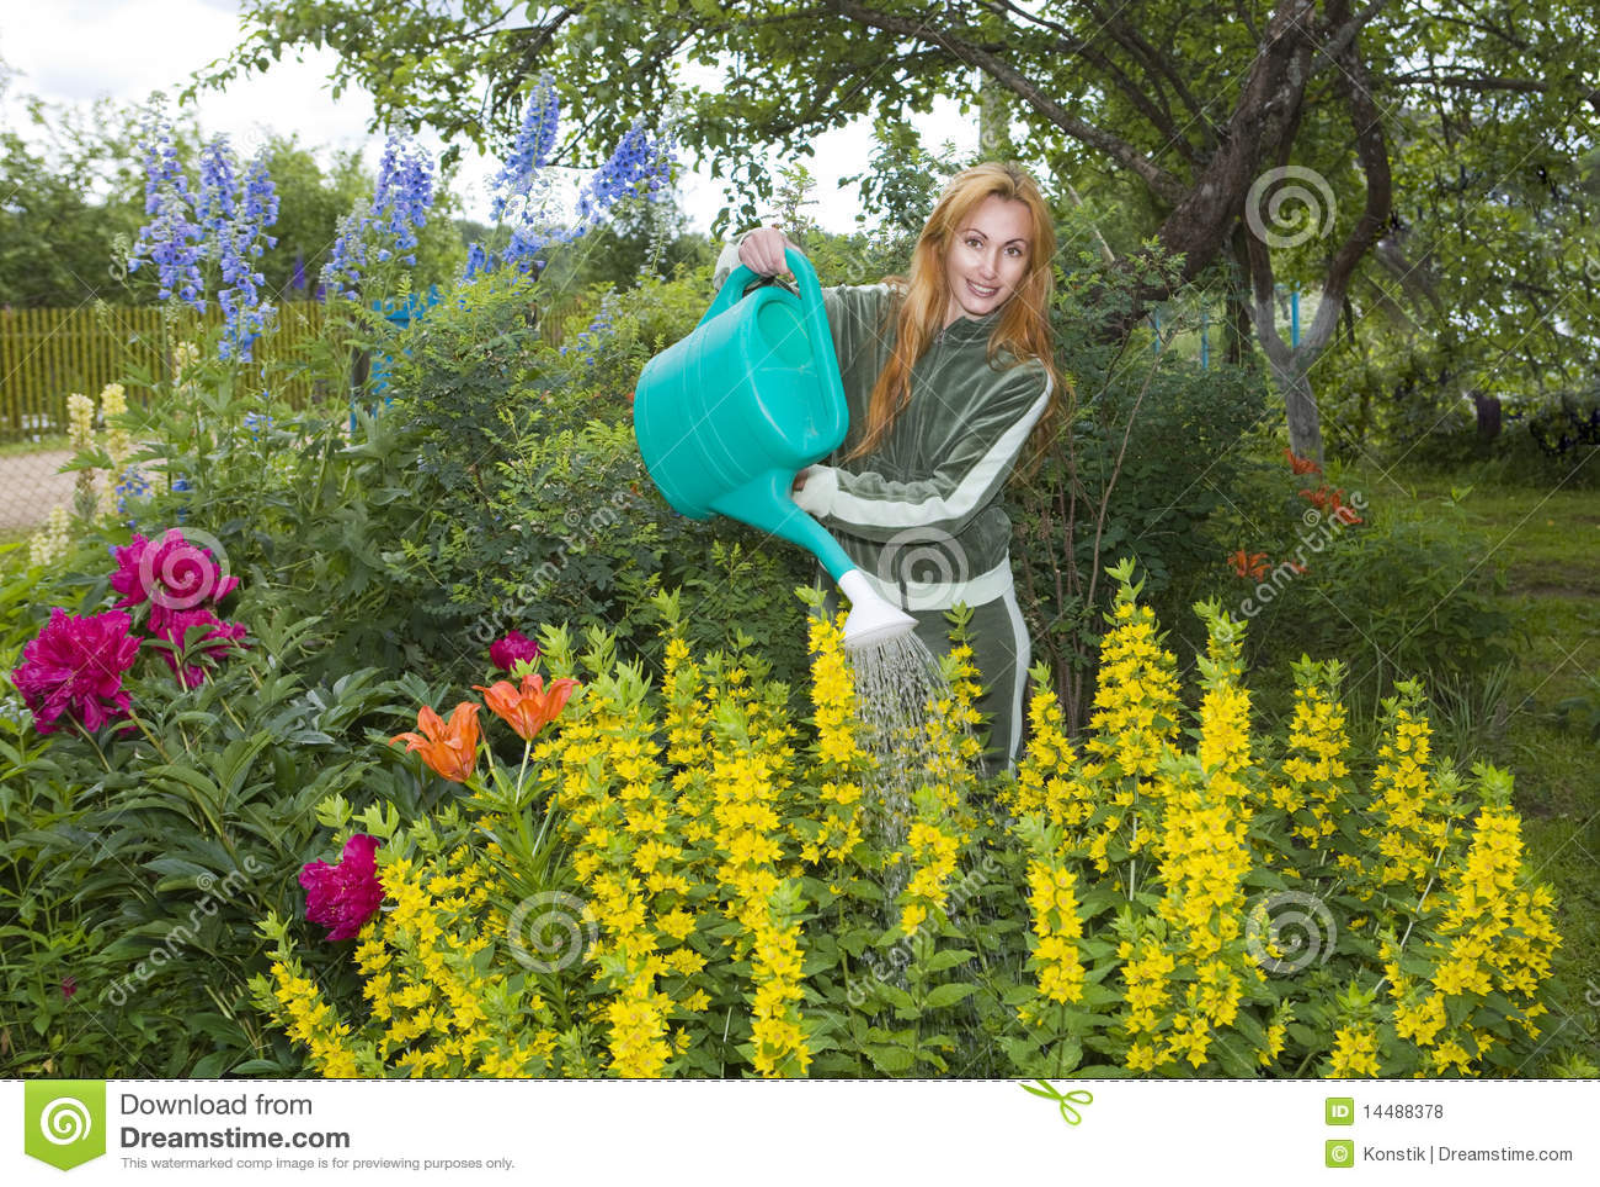 mulher-bonita-nova-molha-flores-no-jardim-14488378.jpg